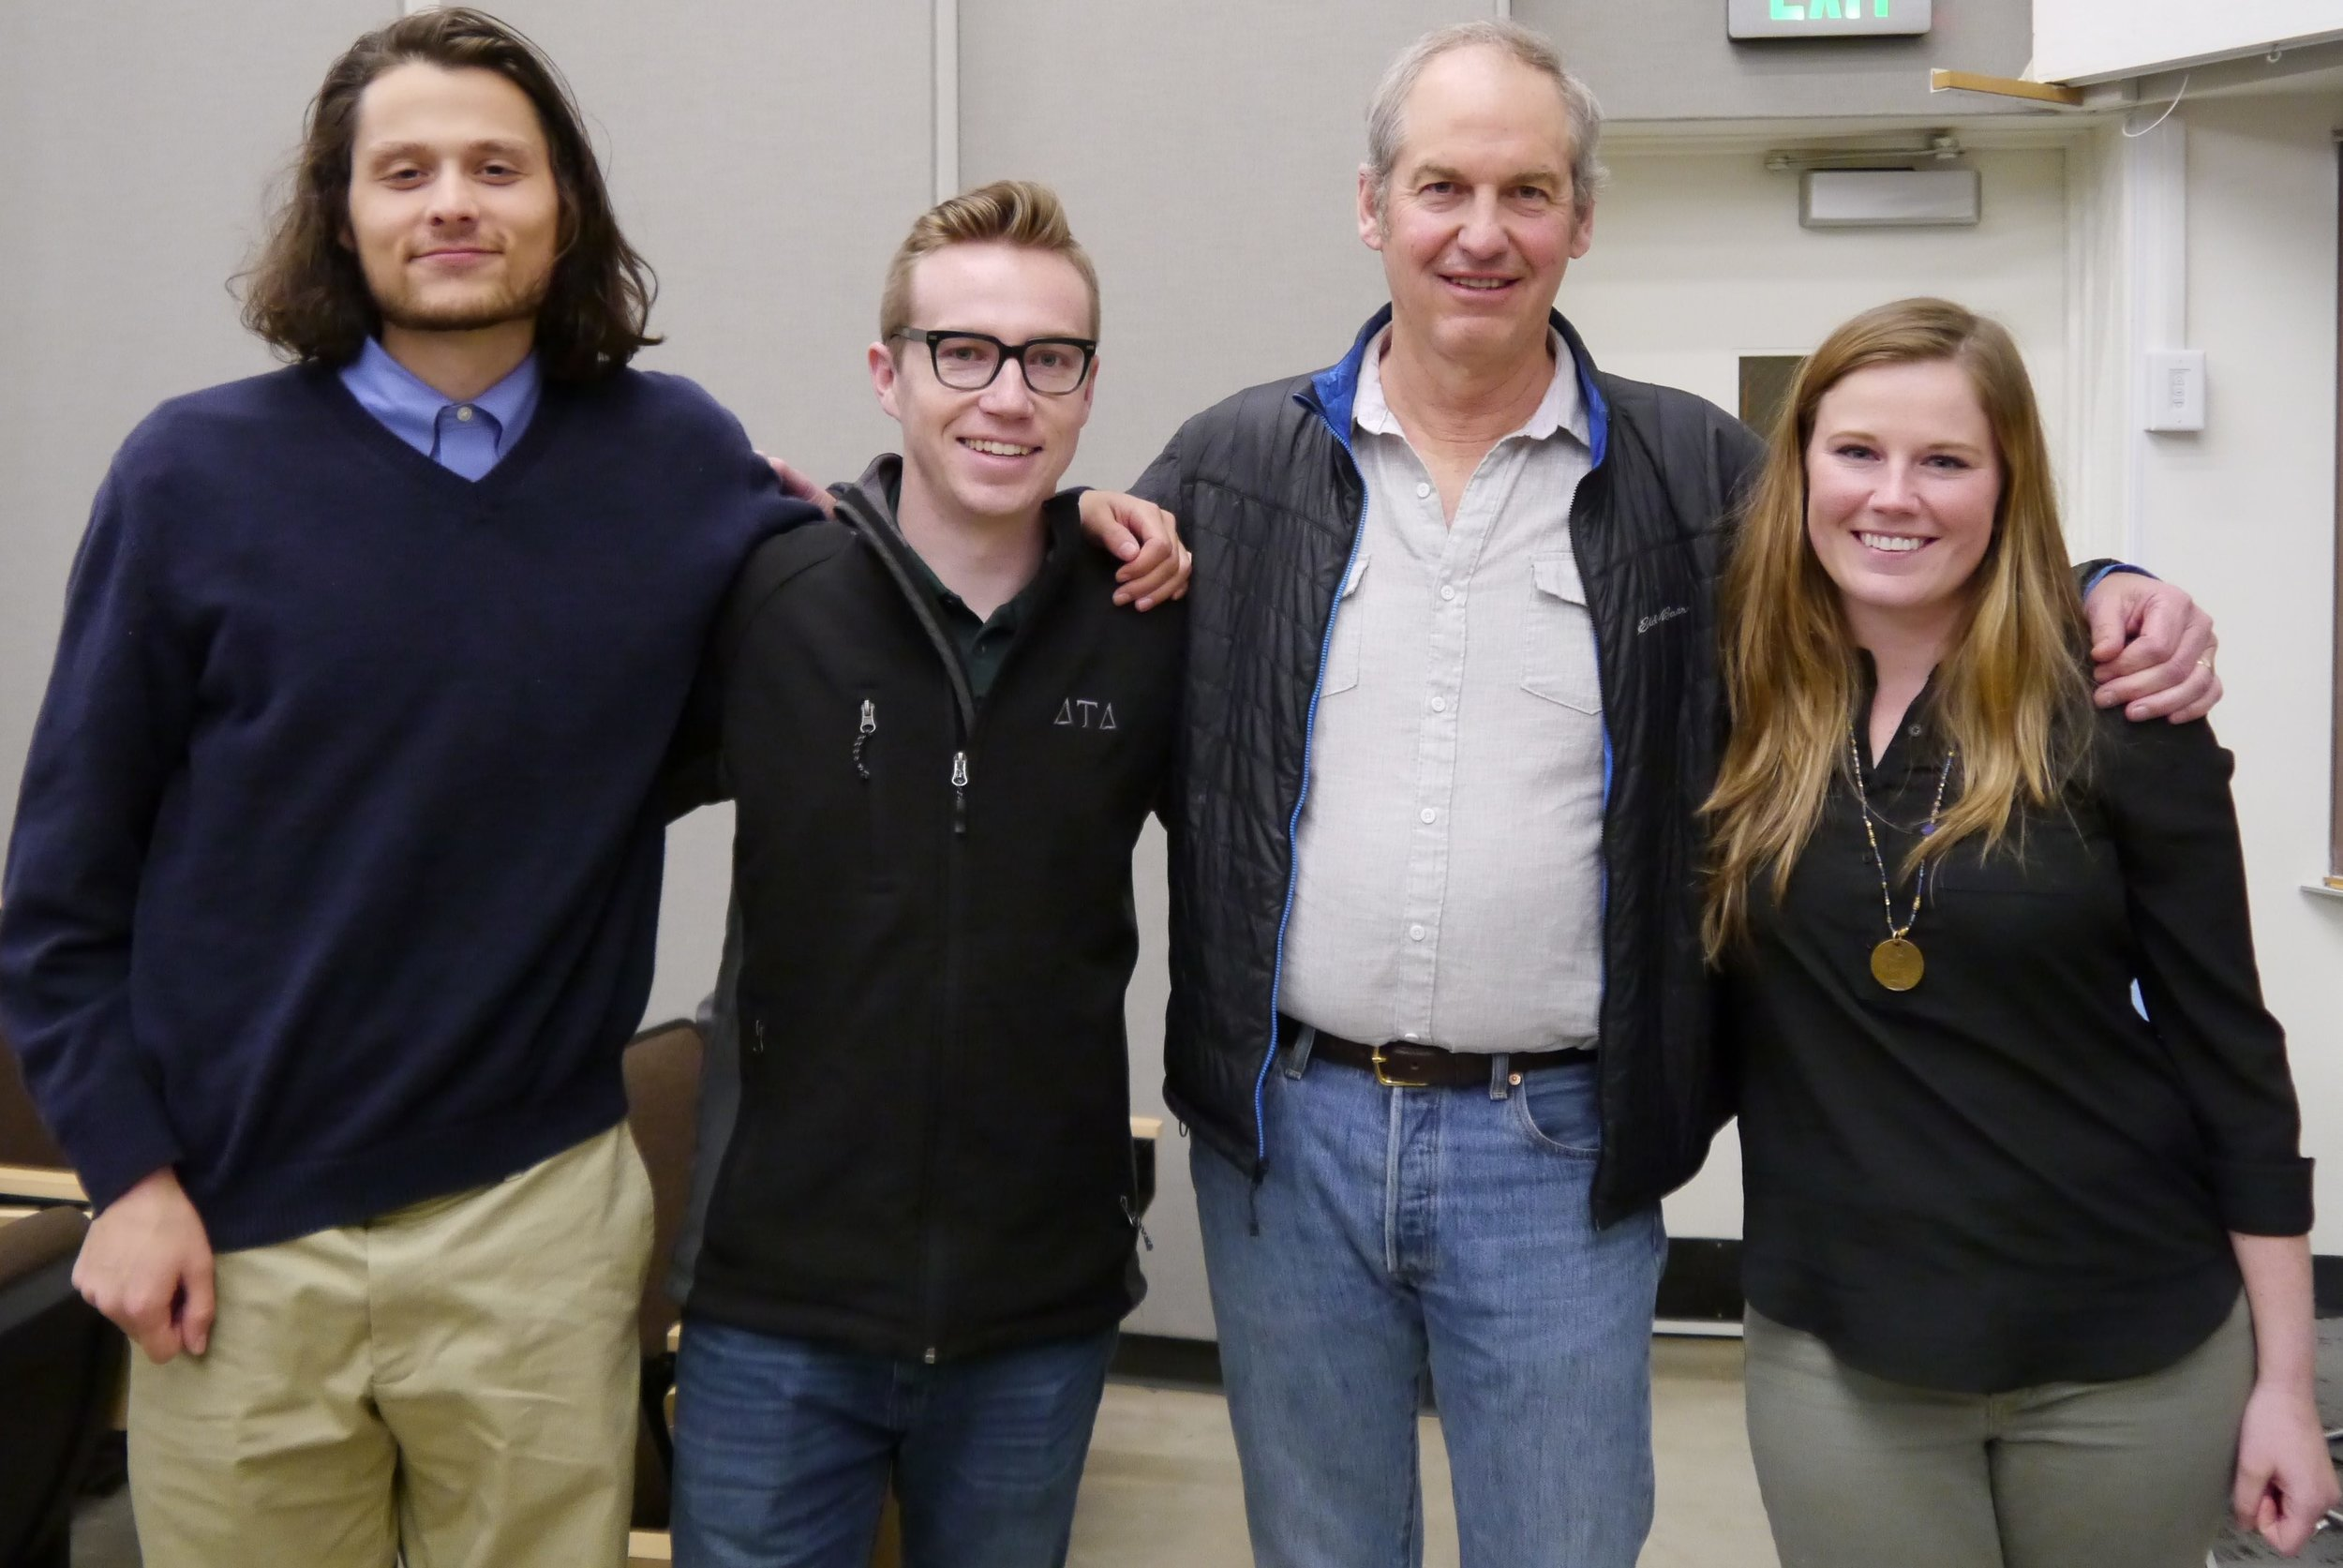 L to R: Martin Harris and Kieran McCann (University of Oregon, BS Earth Sciences), Charles Schelz (BLM Ecologist), and Emily Burke (Southern Oregon University, Environmental Education) K Boehnlein photo